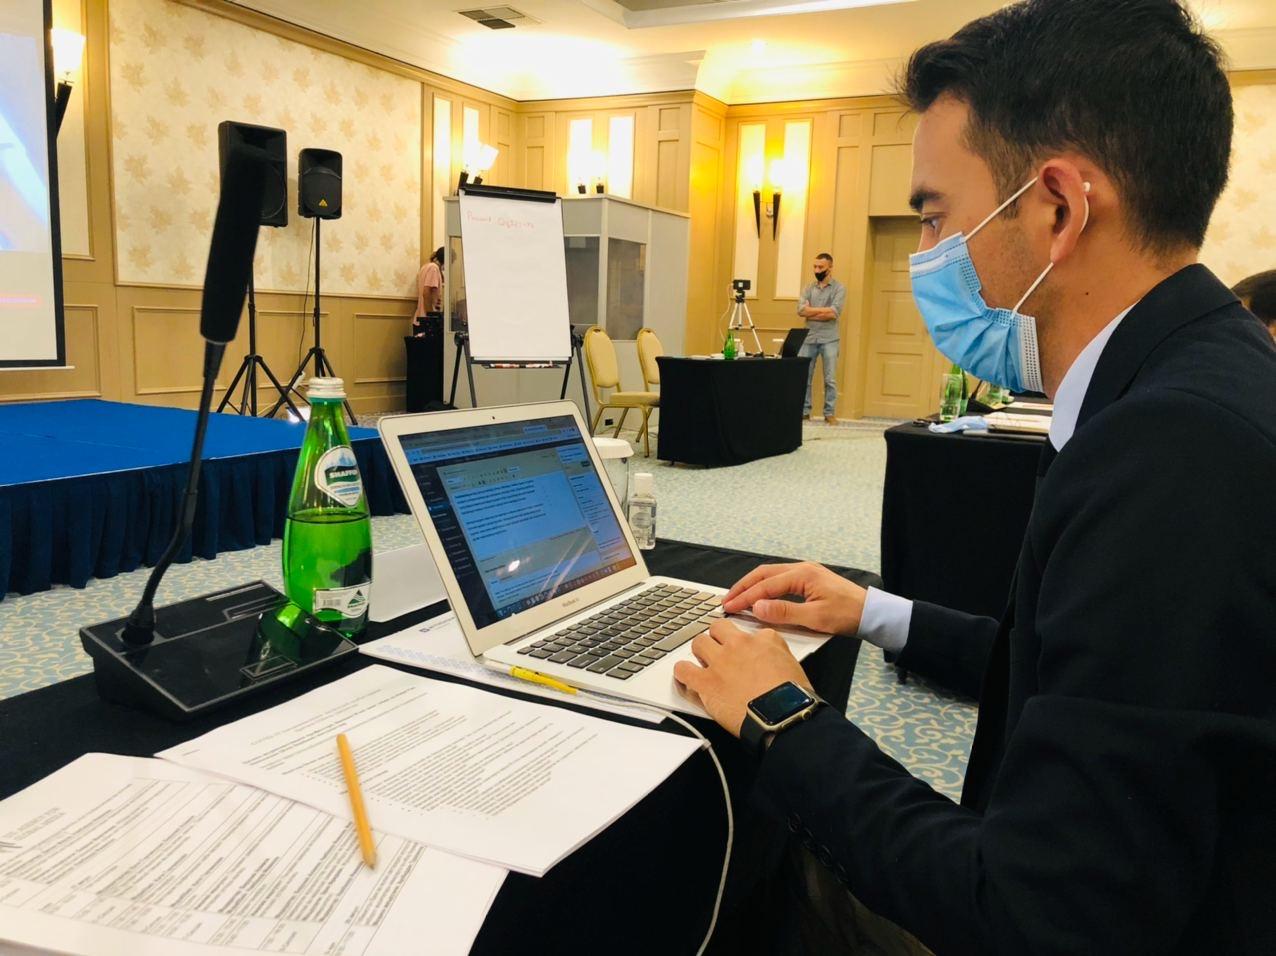 Uzbekistan: Best Practices of Business Reporting for Journalists